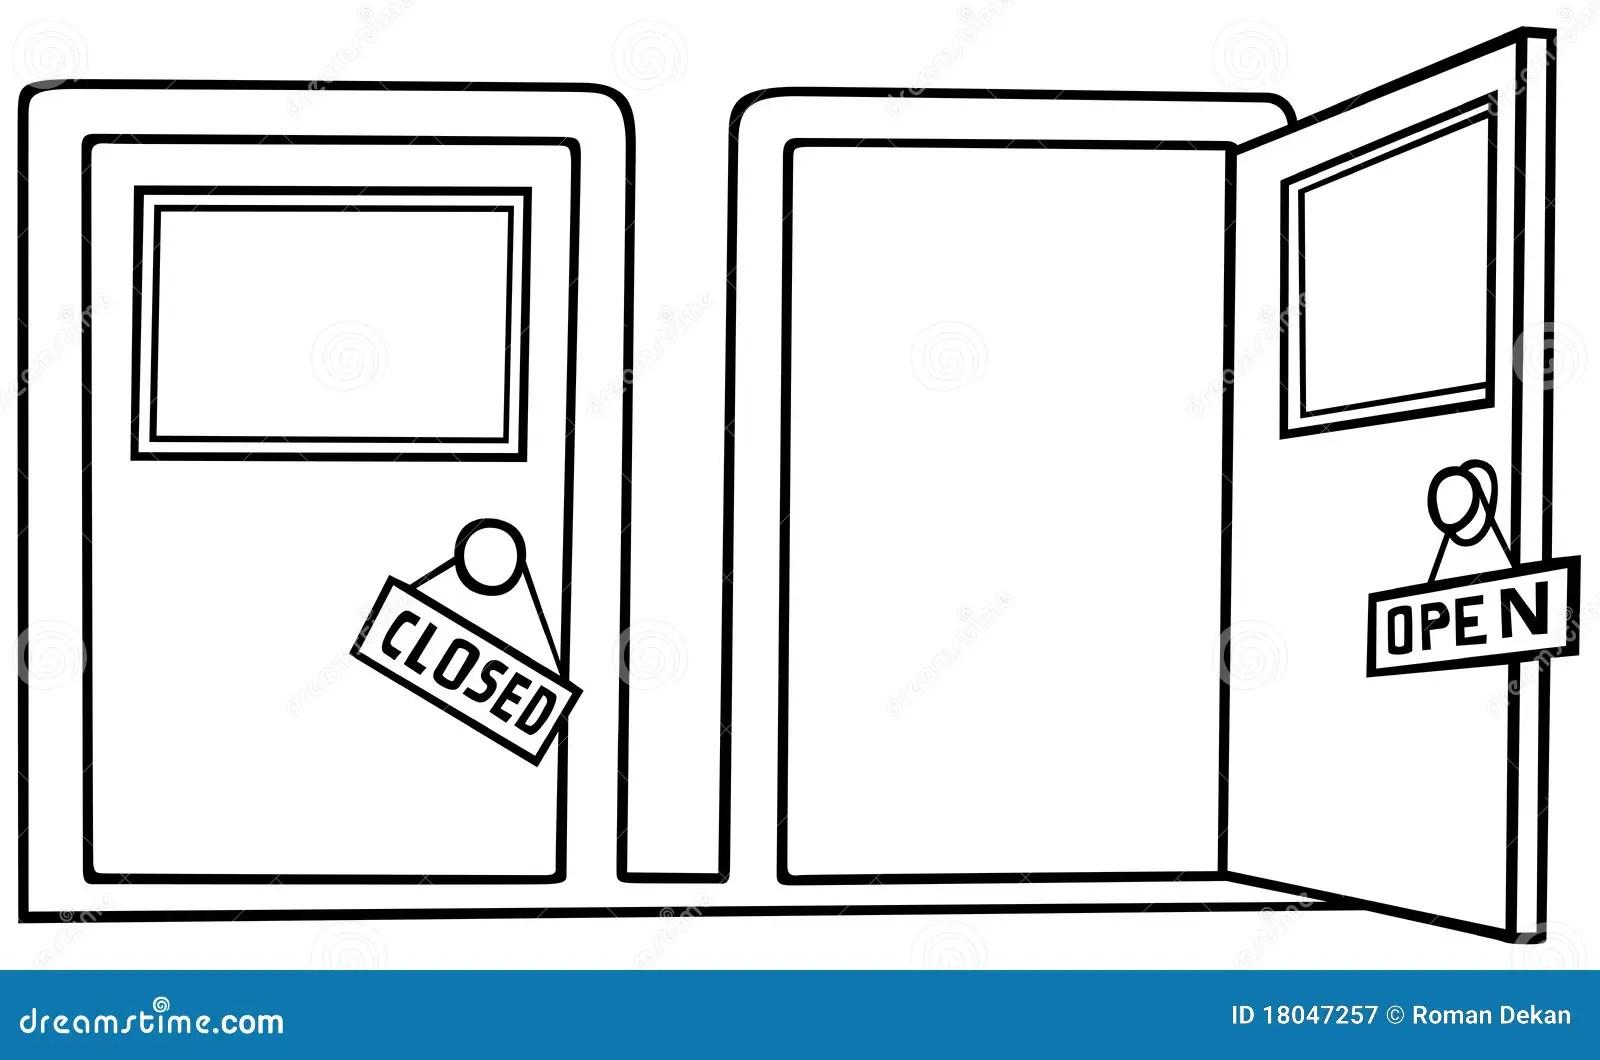 Door Open And Close Stock Vector Illustration Of Open